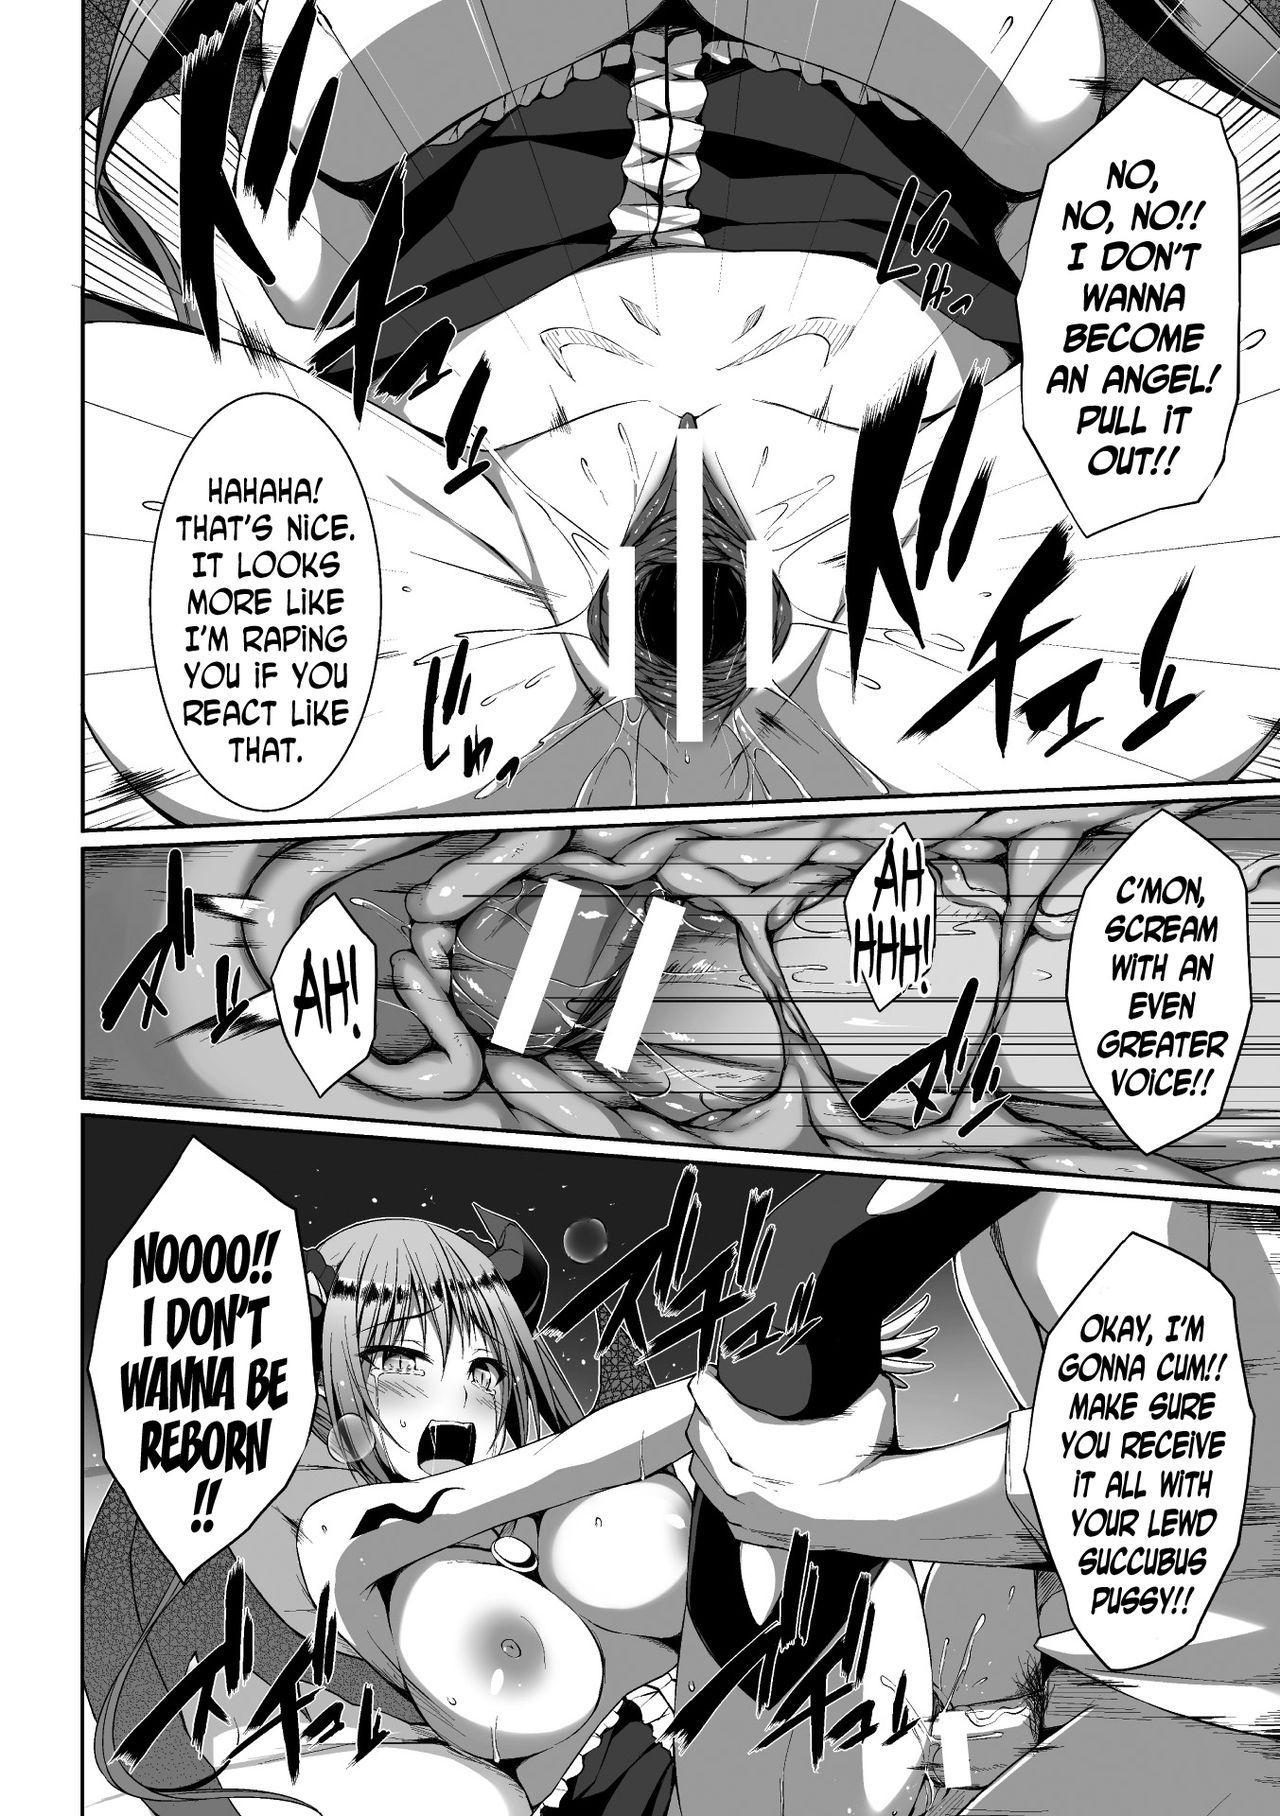 [Anthology] 2D Comic Magazine Tenshi ni Ochiru Akuma-tachi Vol. 1 Ch. 1-3 [English] [N04h] [Digital] 15